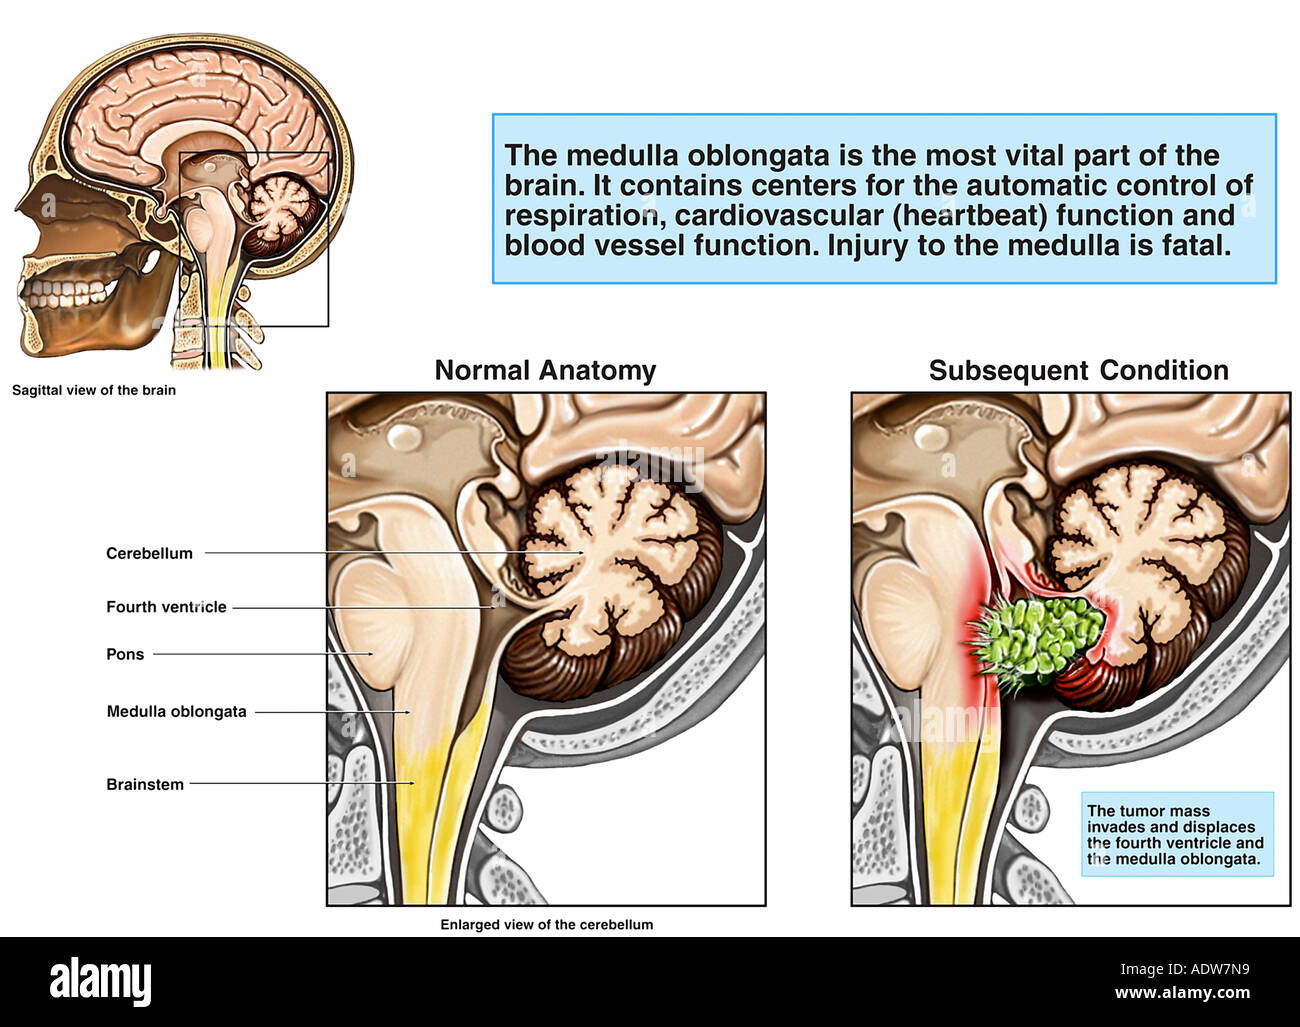 Invasive Tumor of the Brainstem - Stock Image